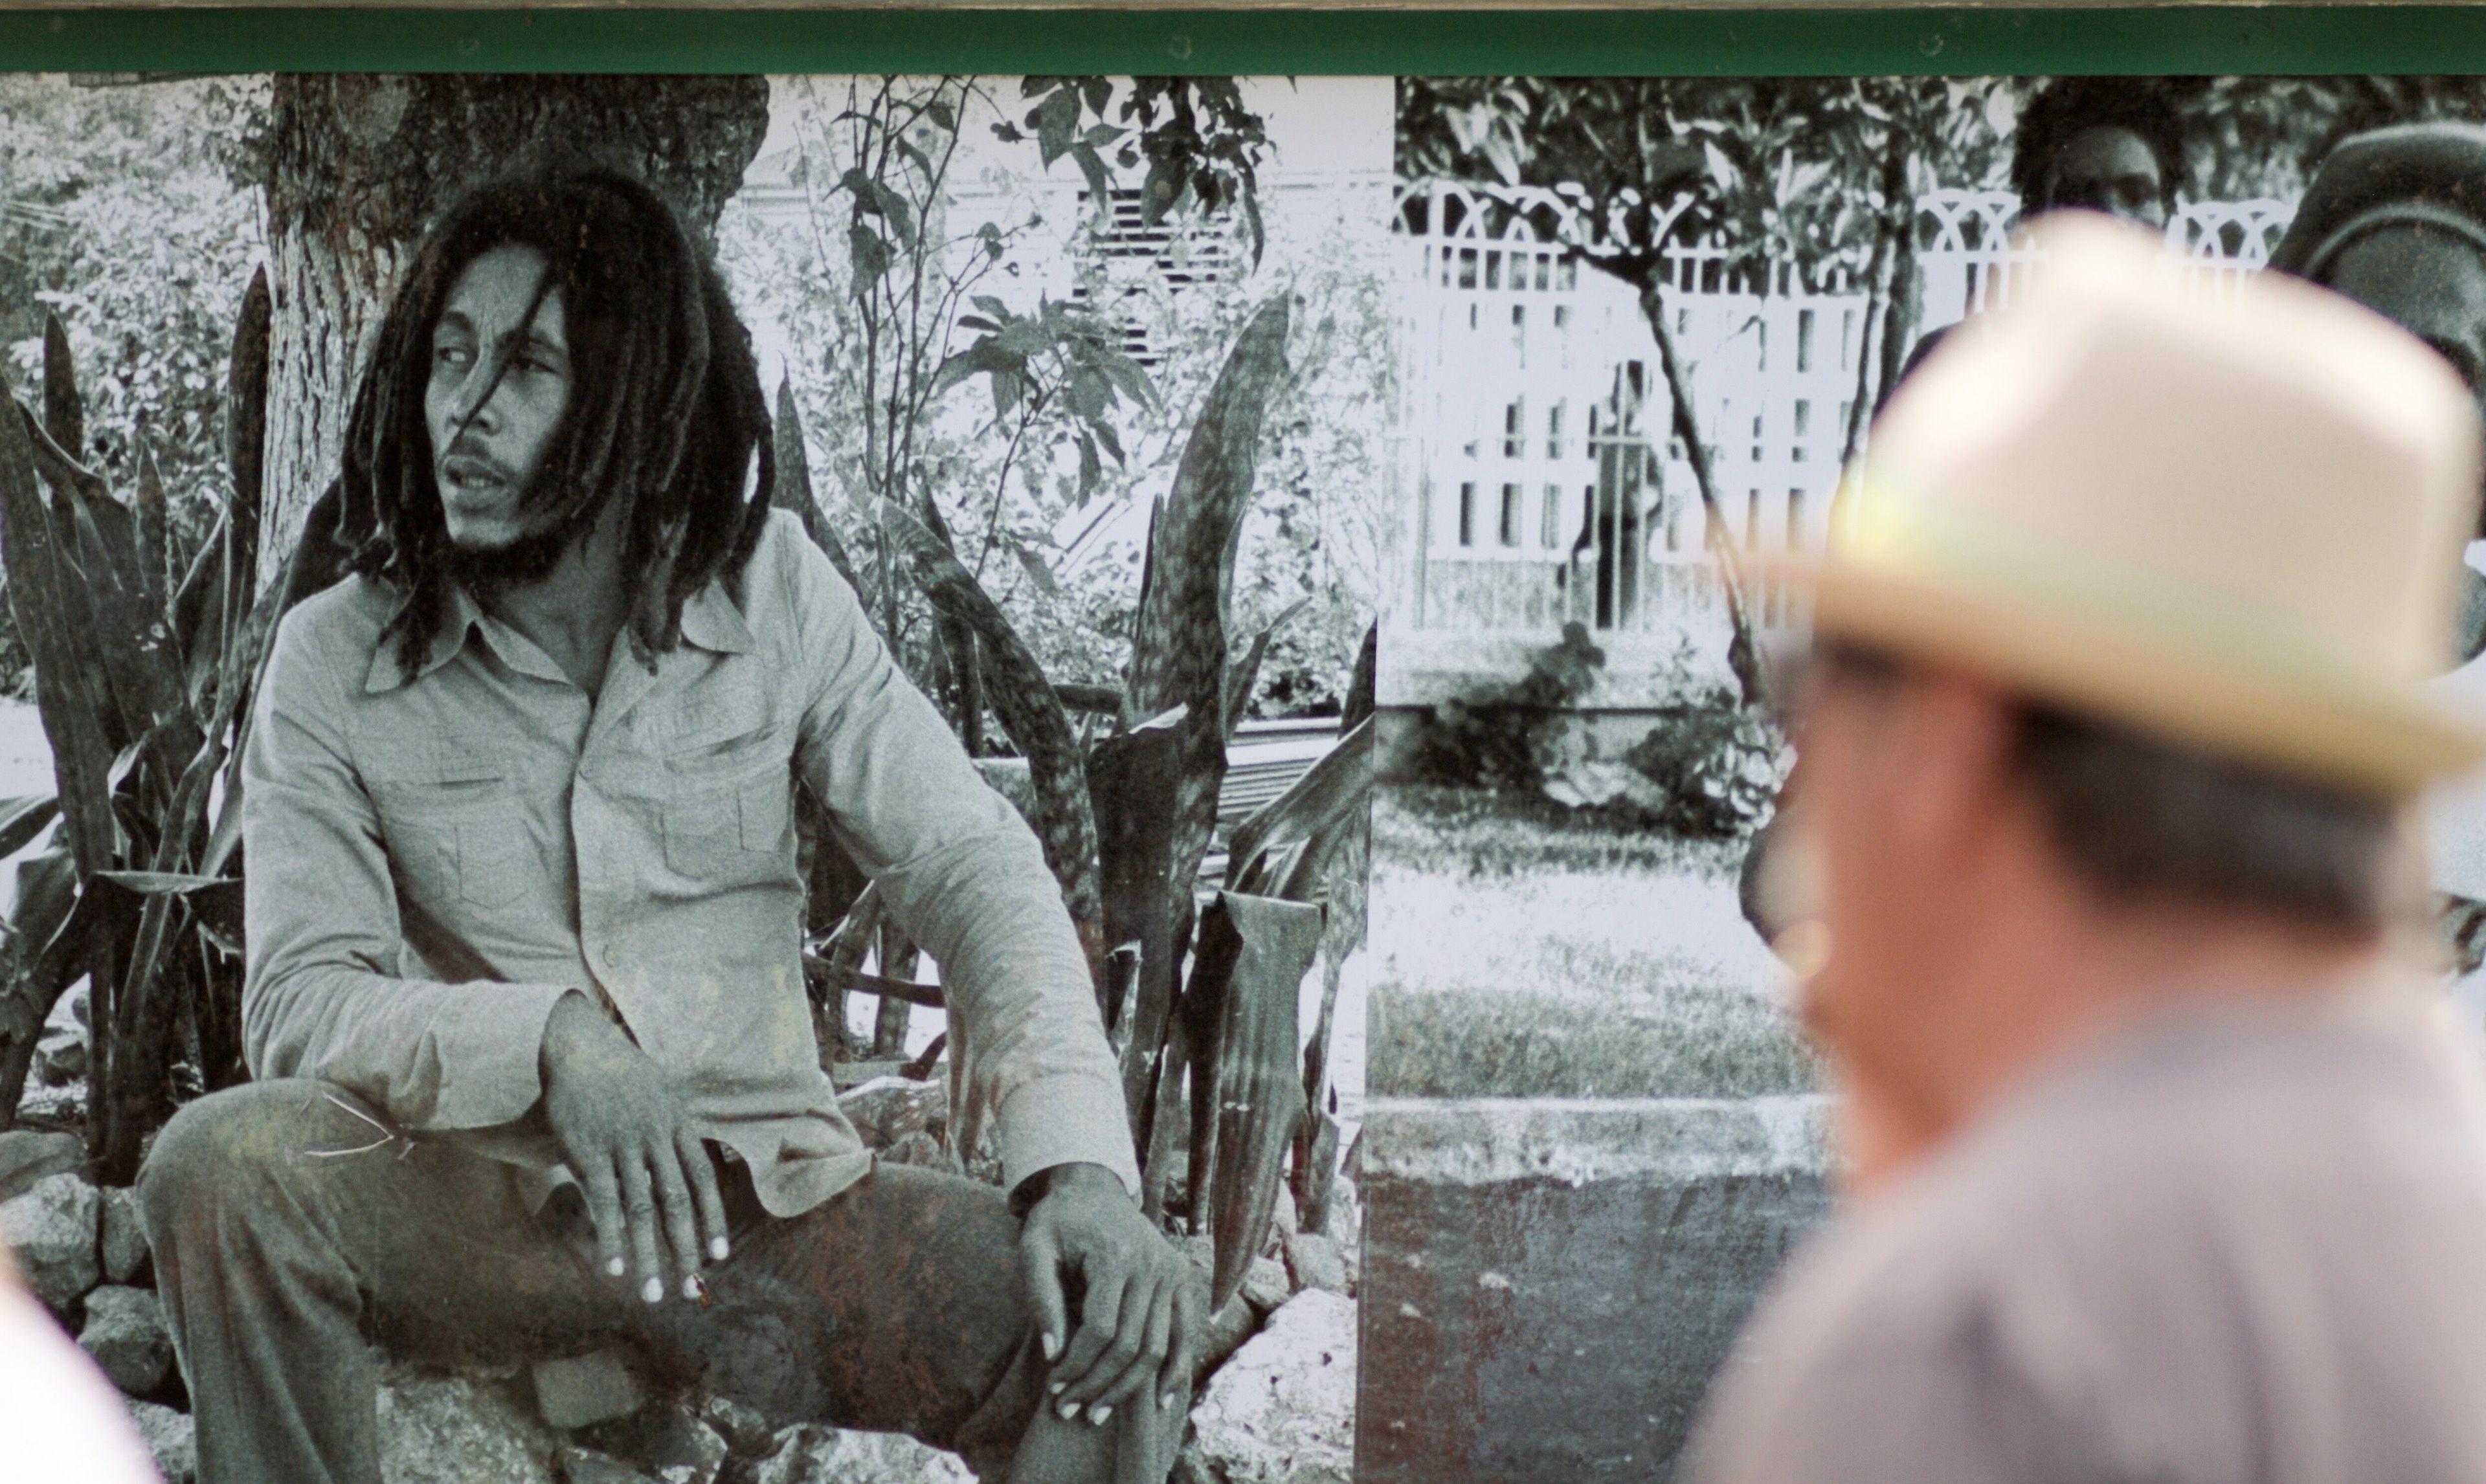 Sights & Sounds of Bob Marley